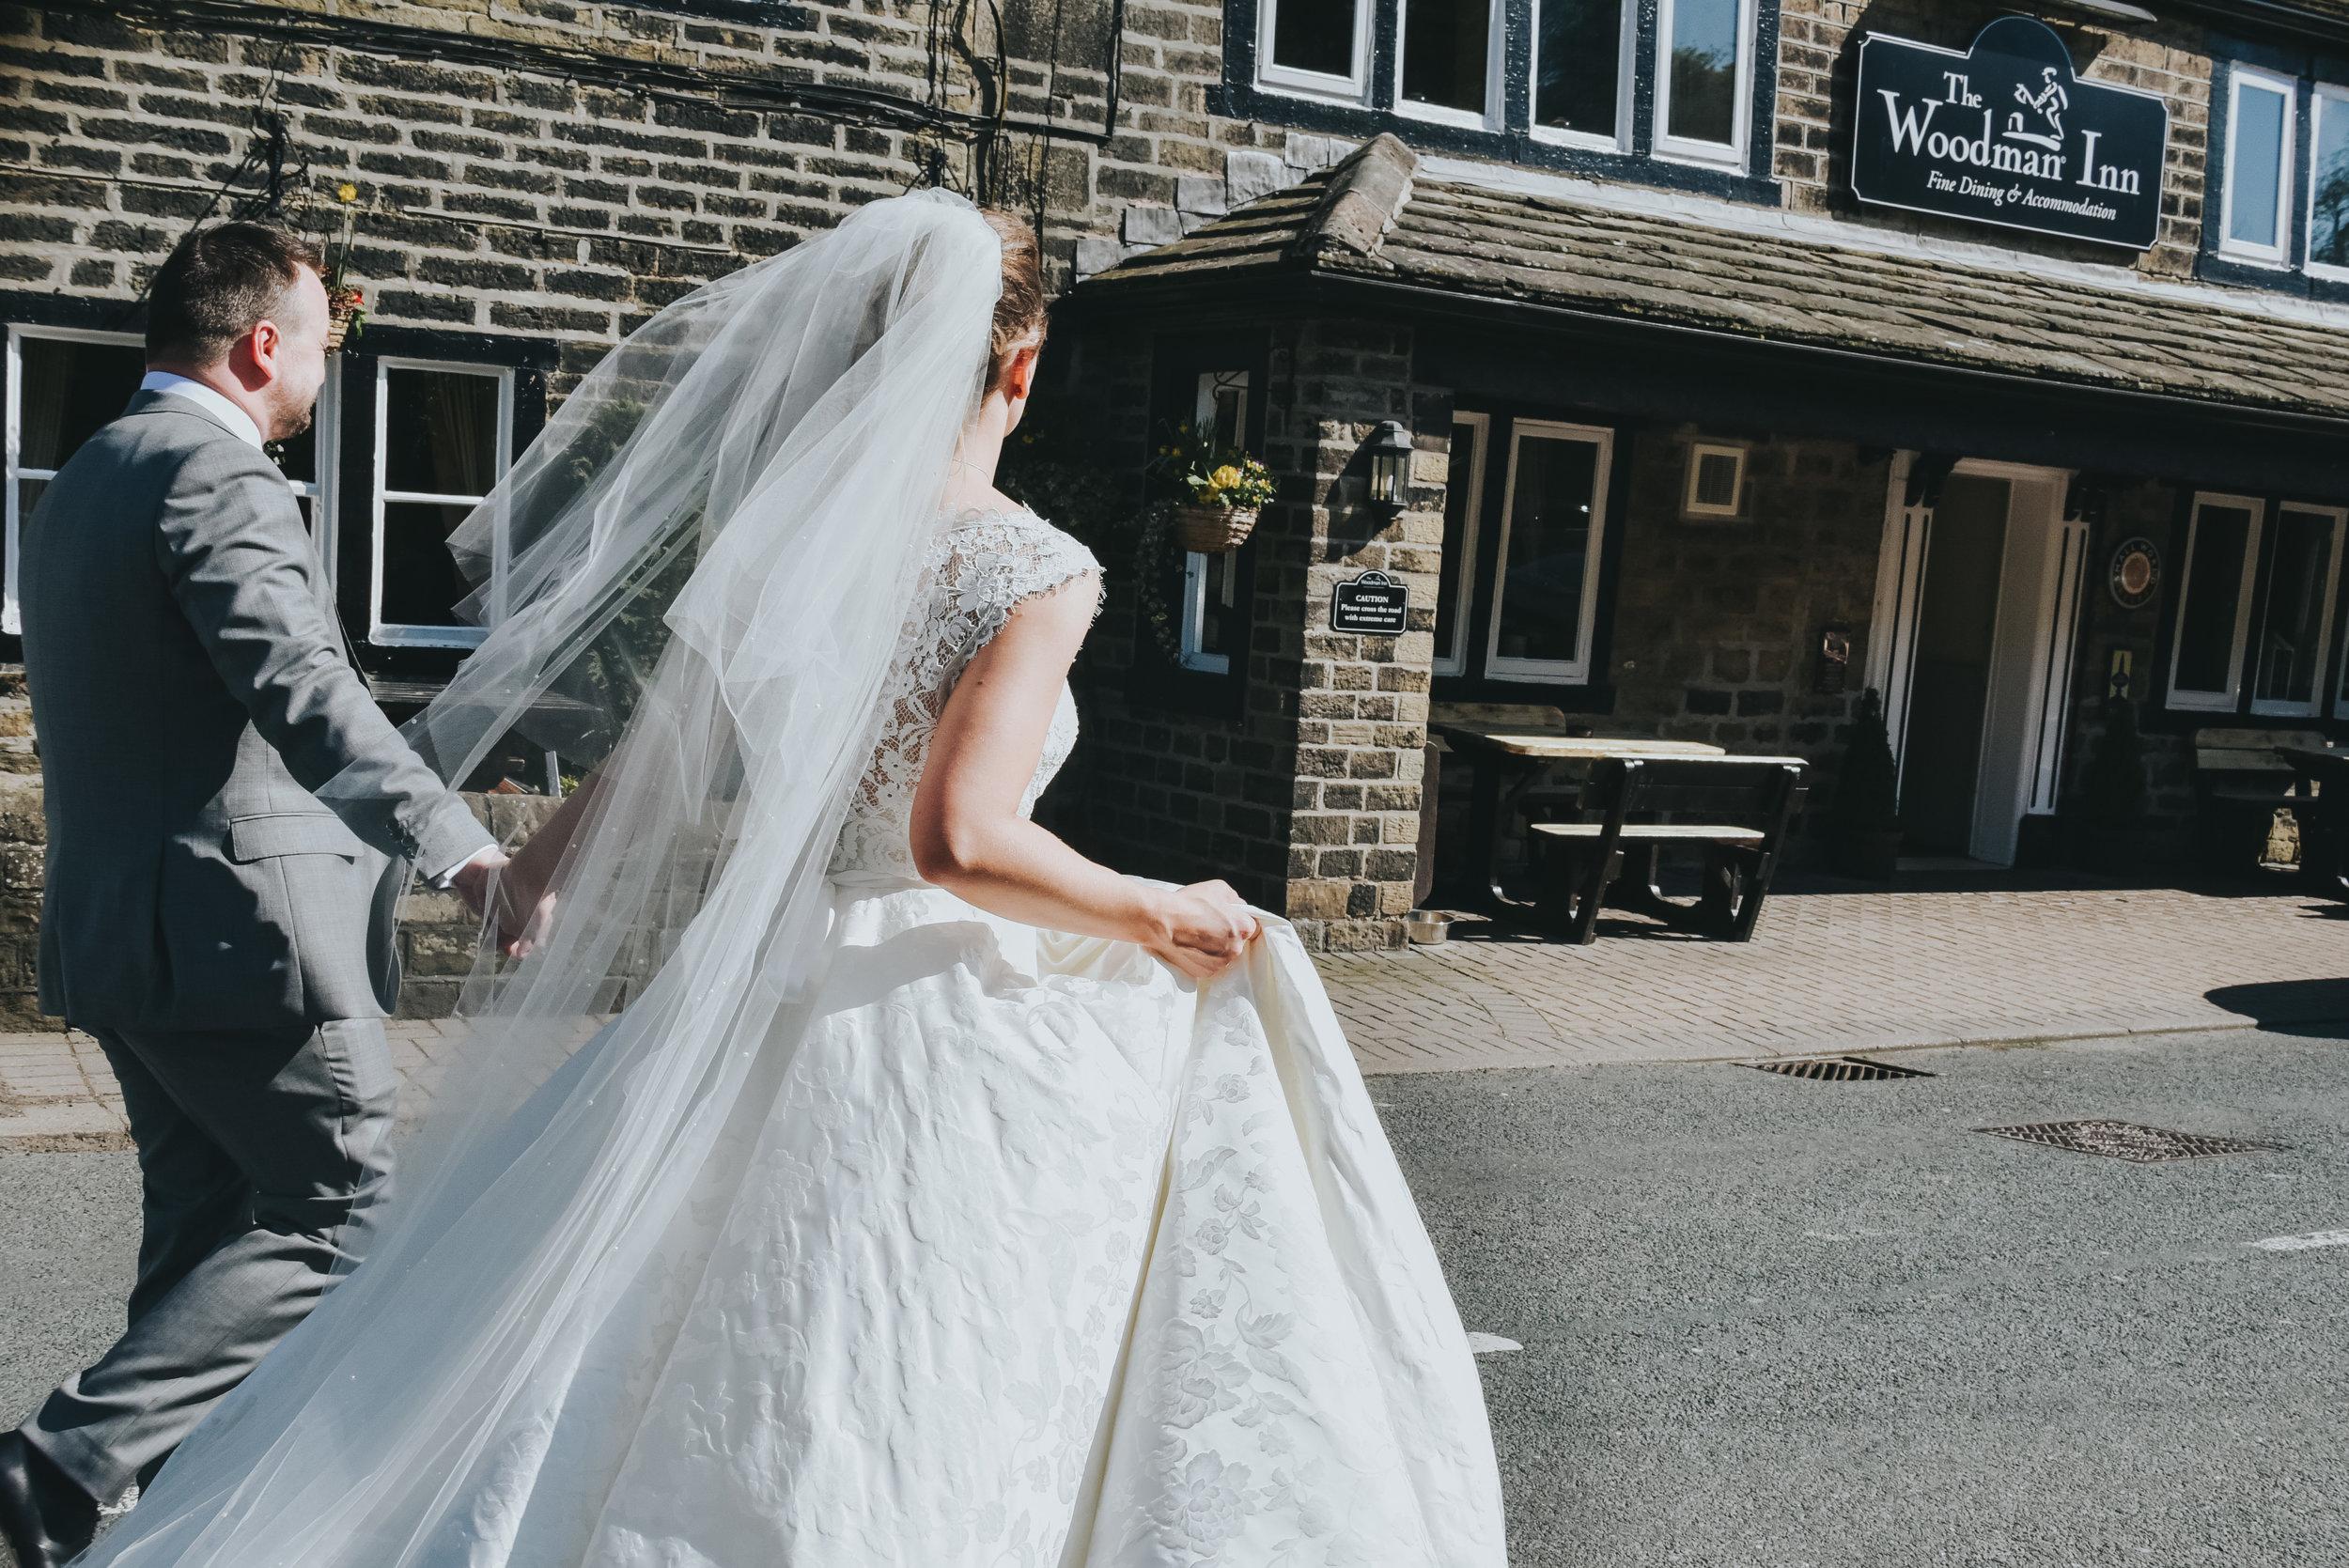 bride and groom outside Woodman Inn